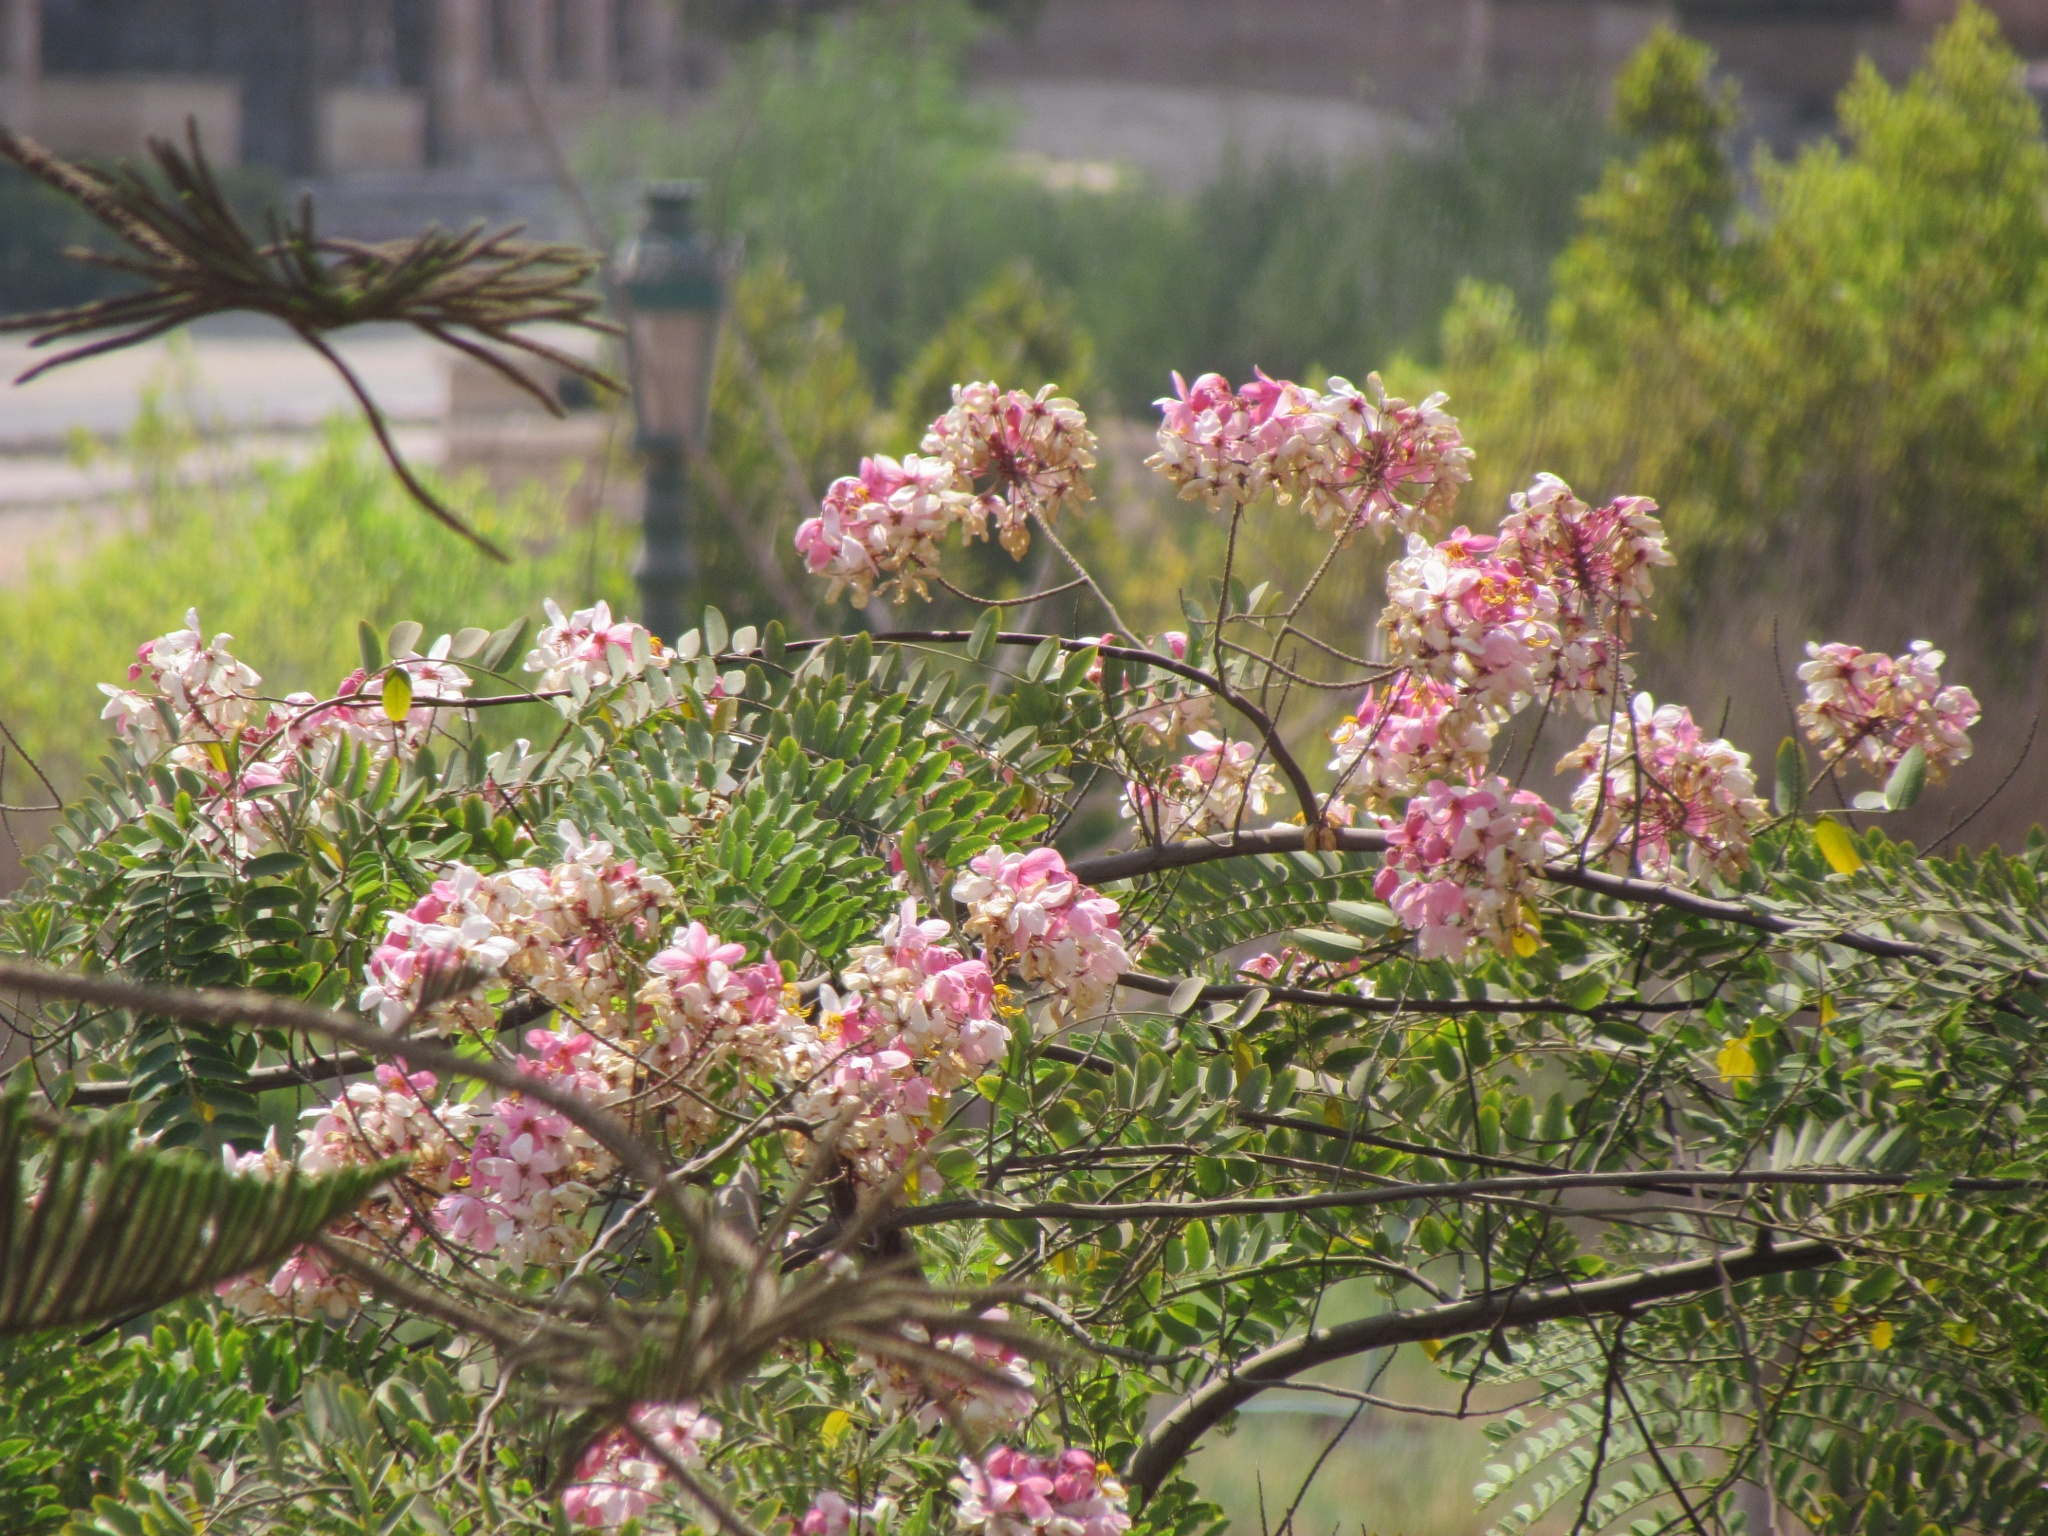 Spring flowers by Wael Wafi